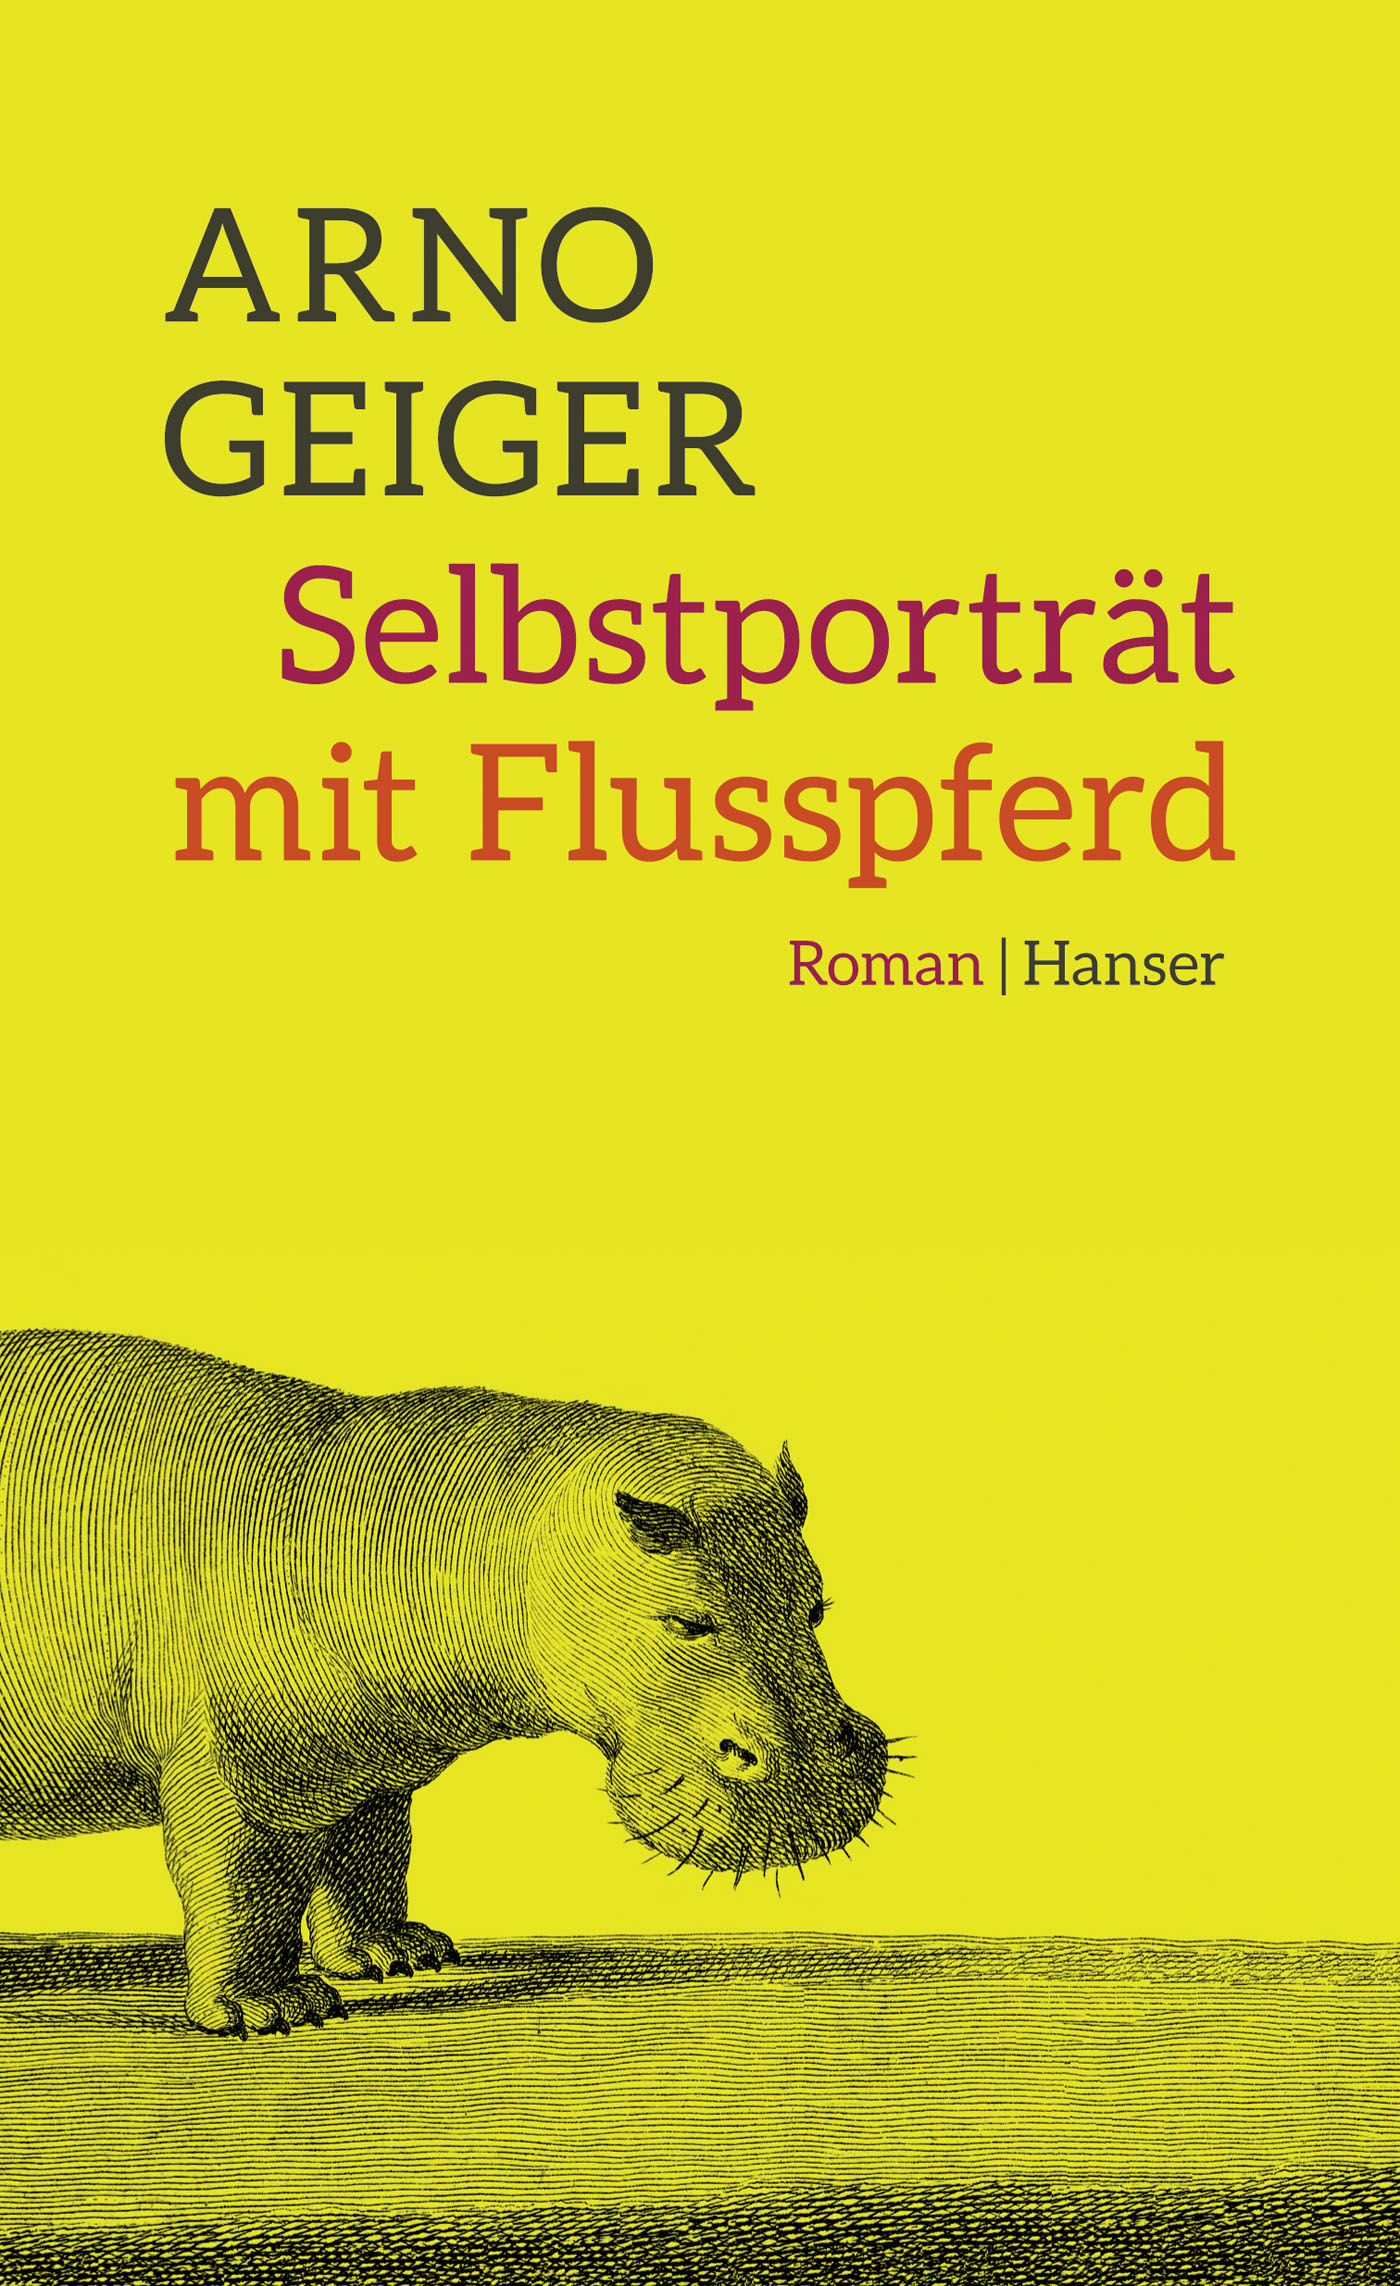 Arno Geiger Köln Lesung